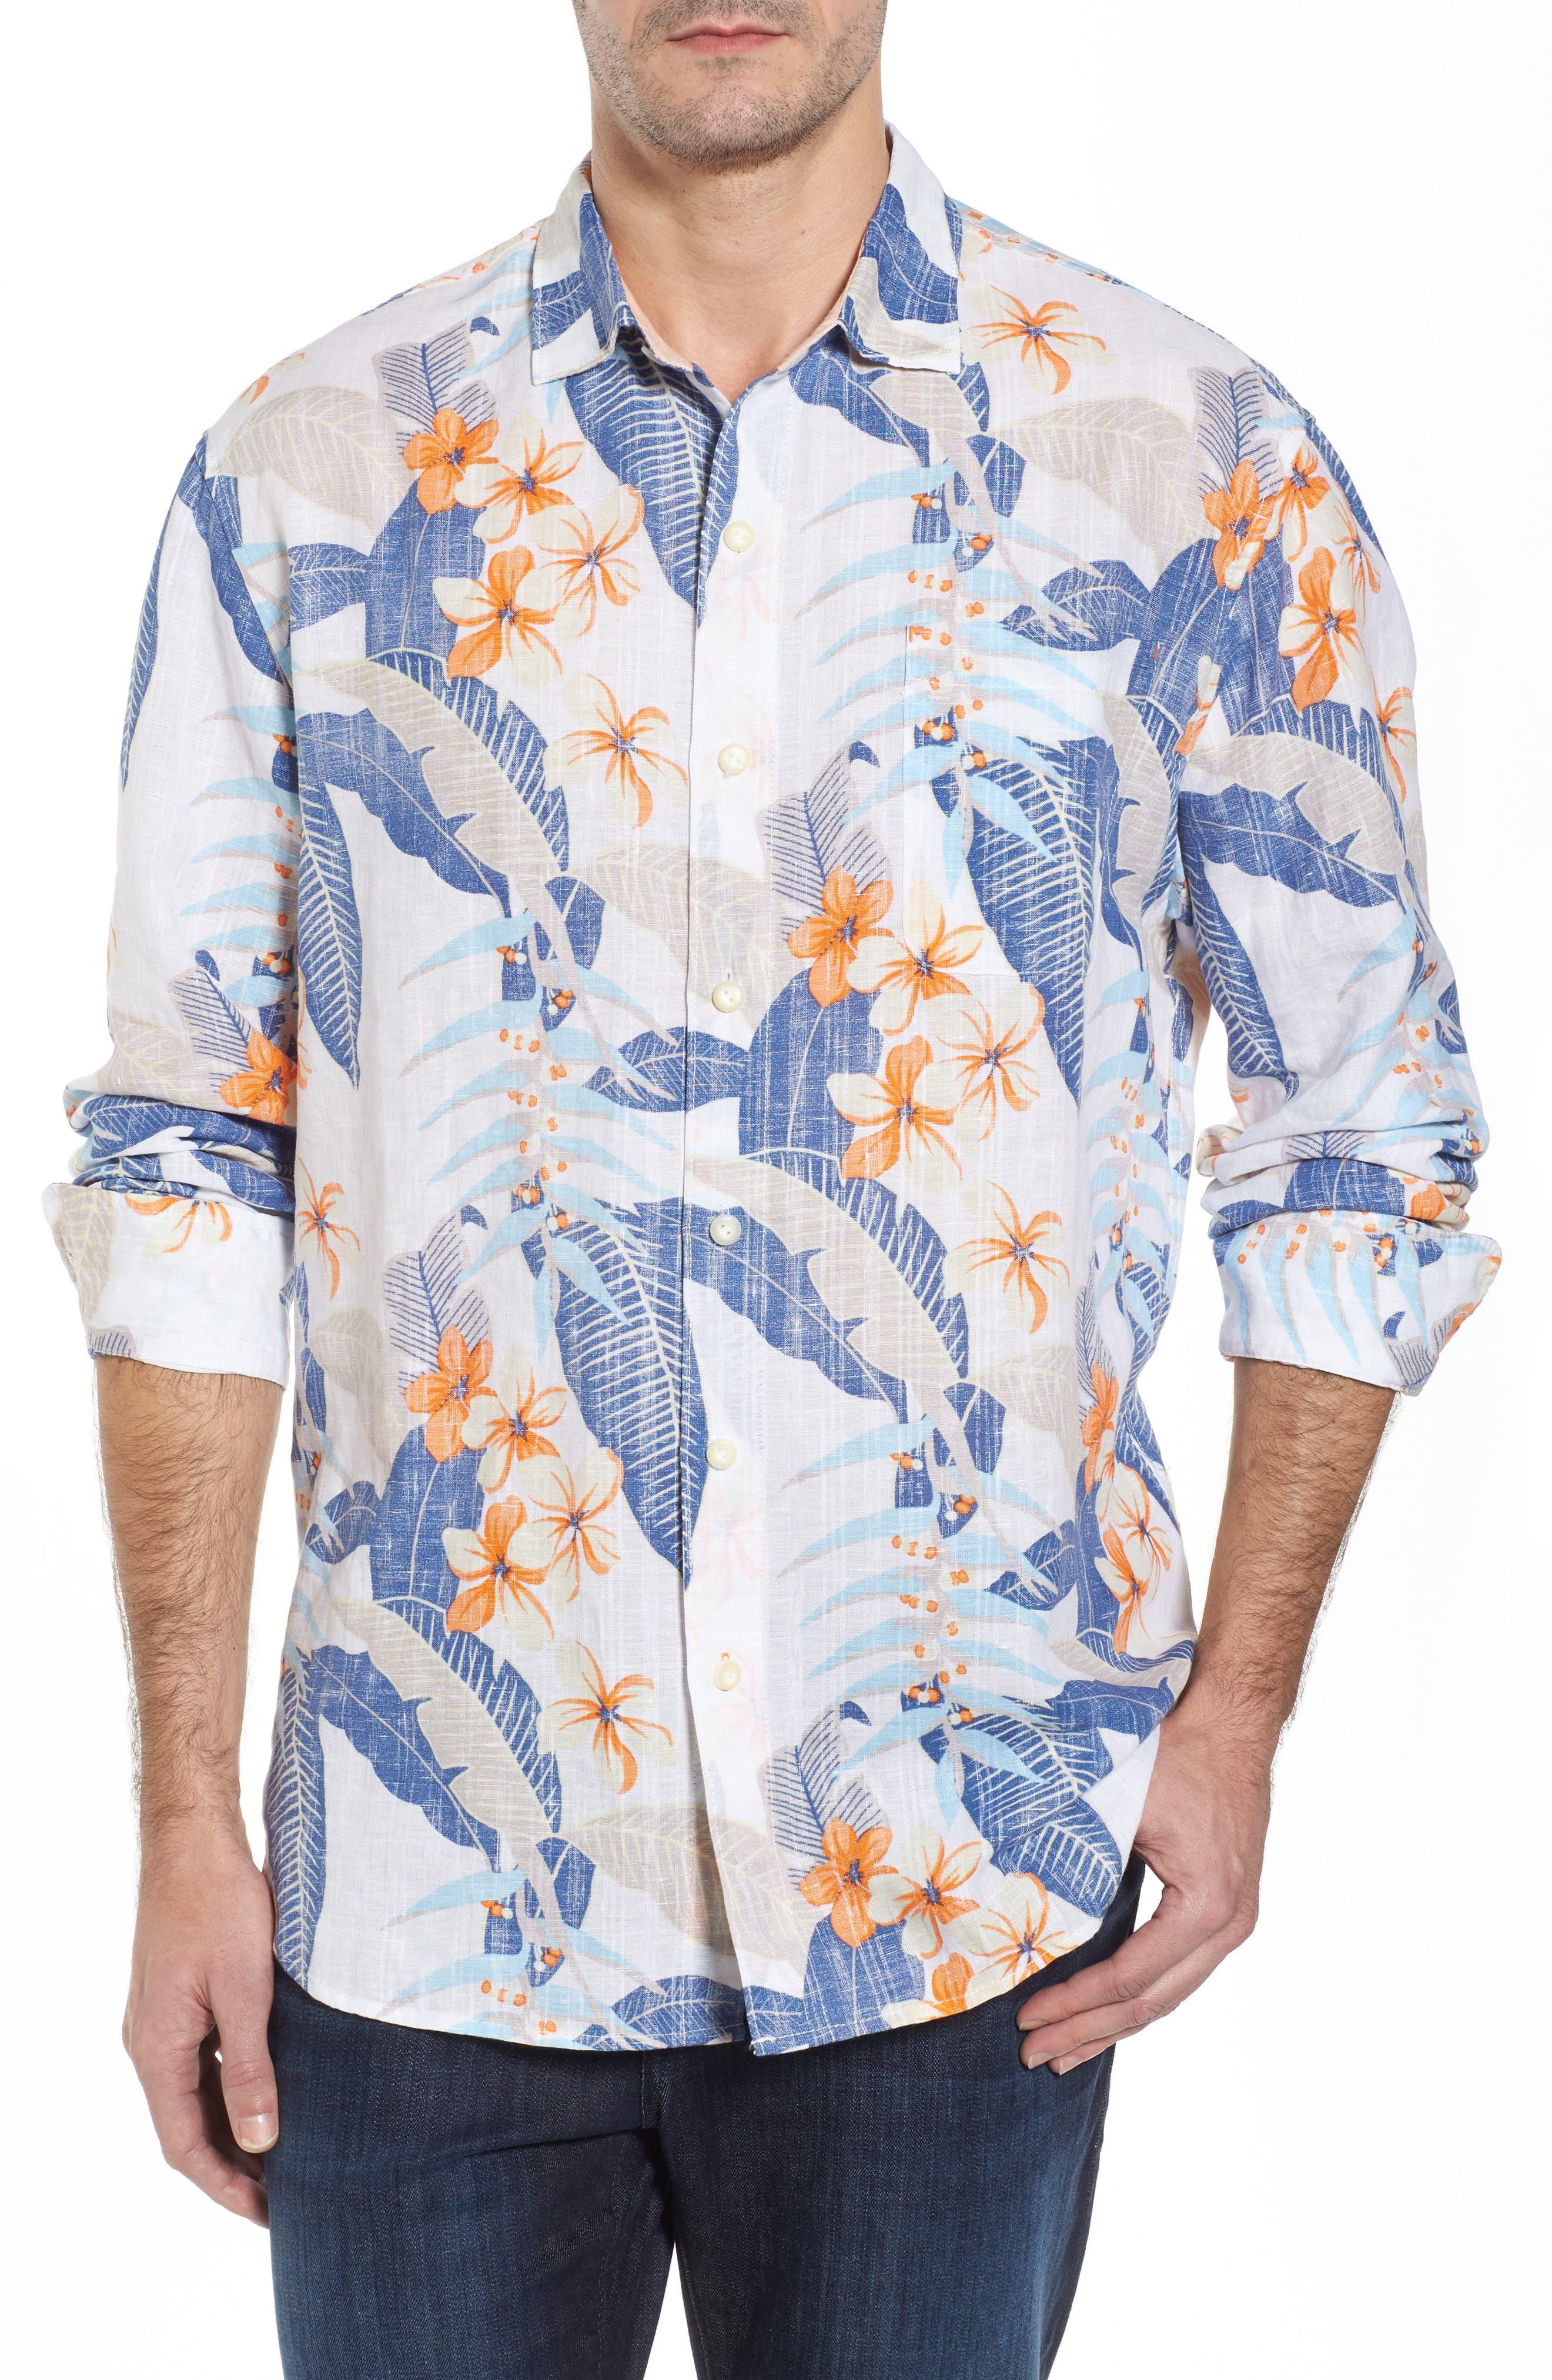 Alternate Image 1 Selected - Tommy Bahama Liviea Leaves Linen Blend Camp Shirt